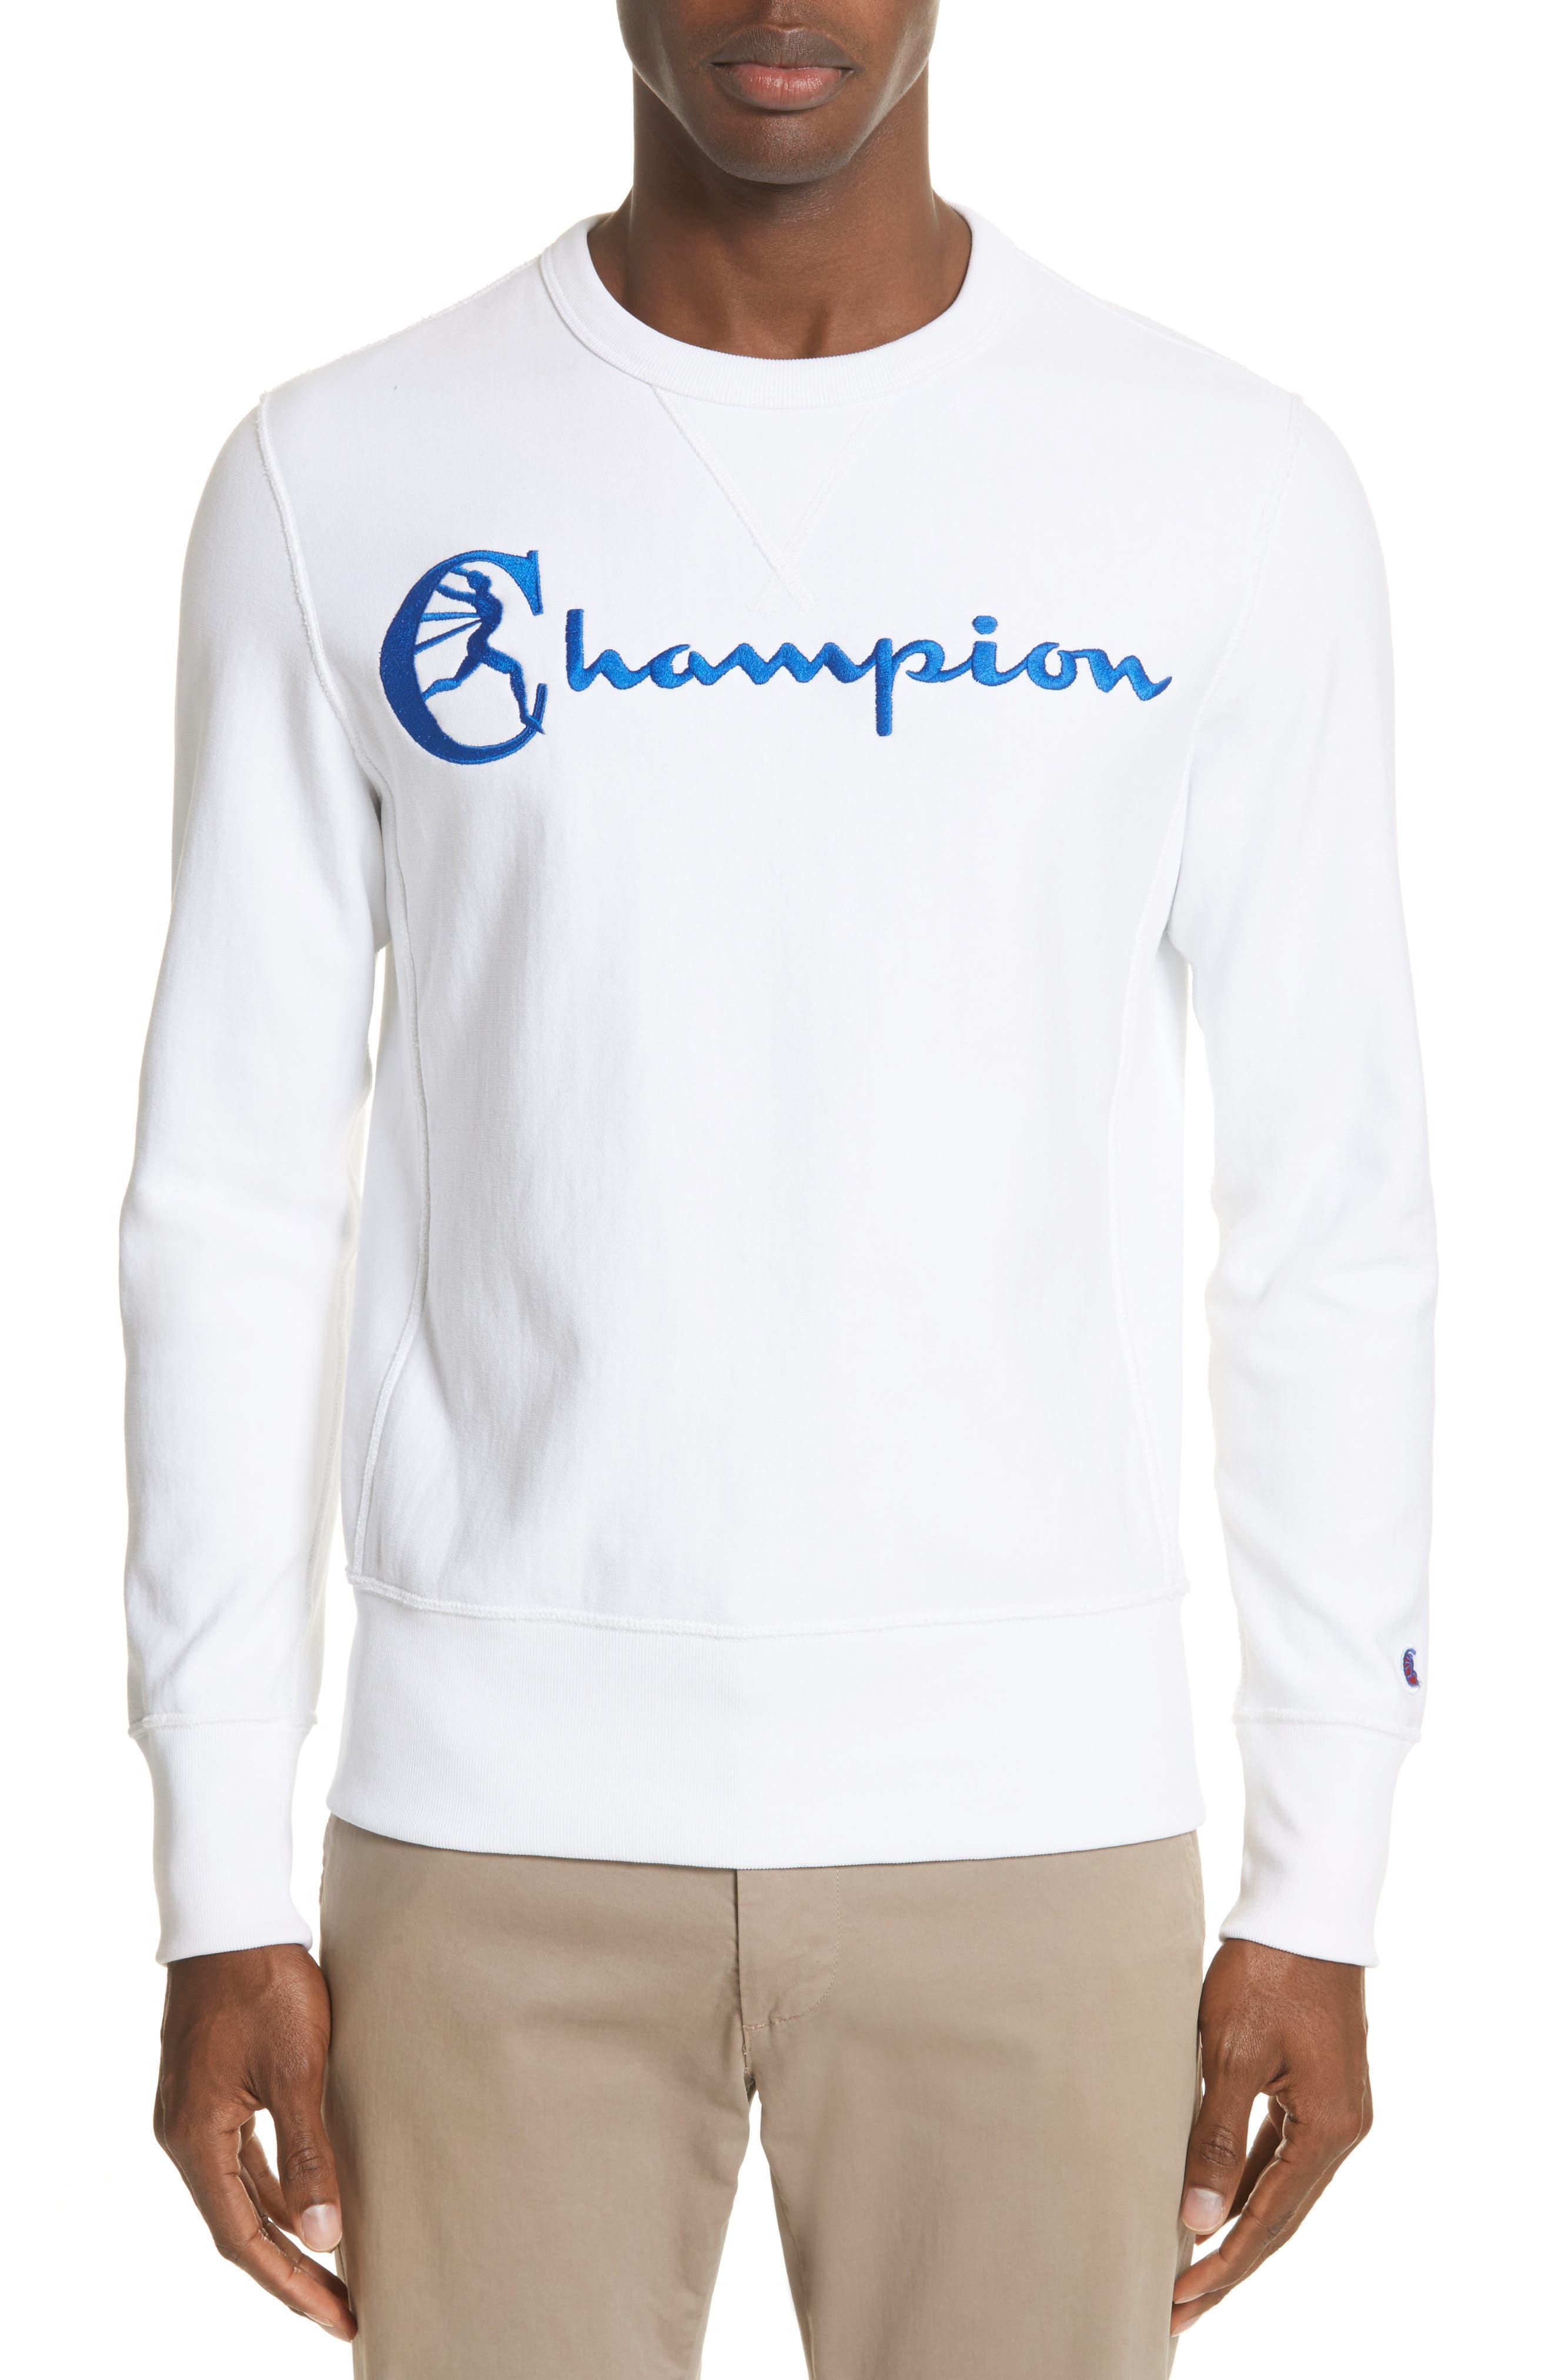 62c3ec43 Where To Buy Champion Sweatshirts